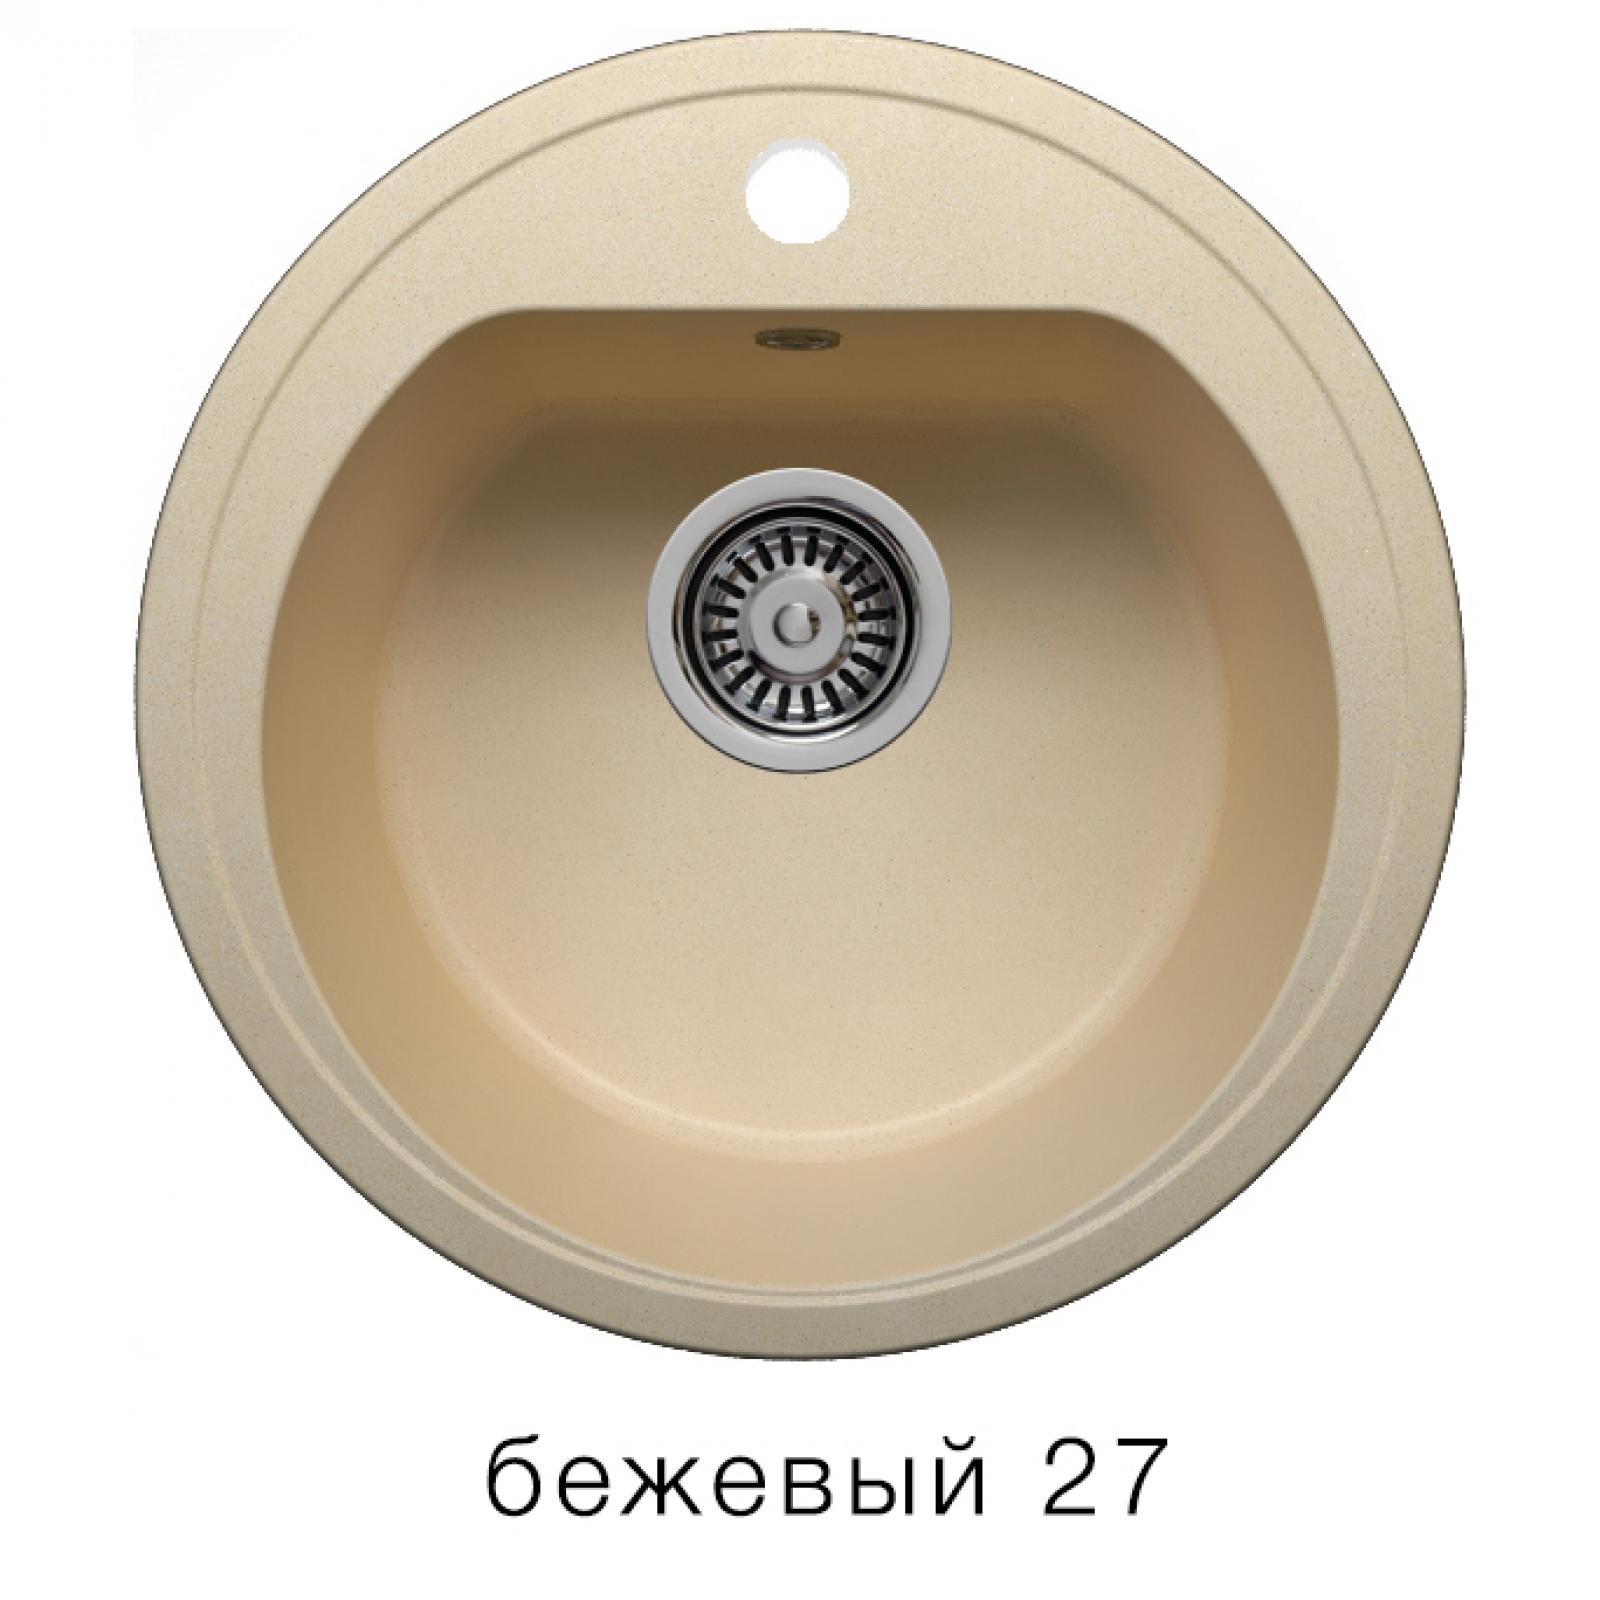 Мойка Polygran-F-05-027, цвет - Бежевый